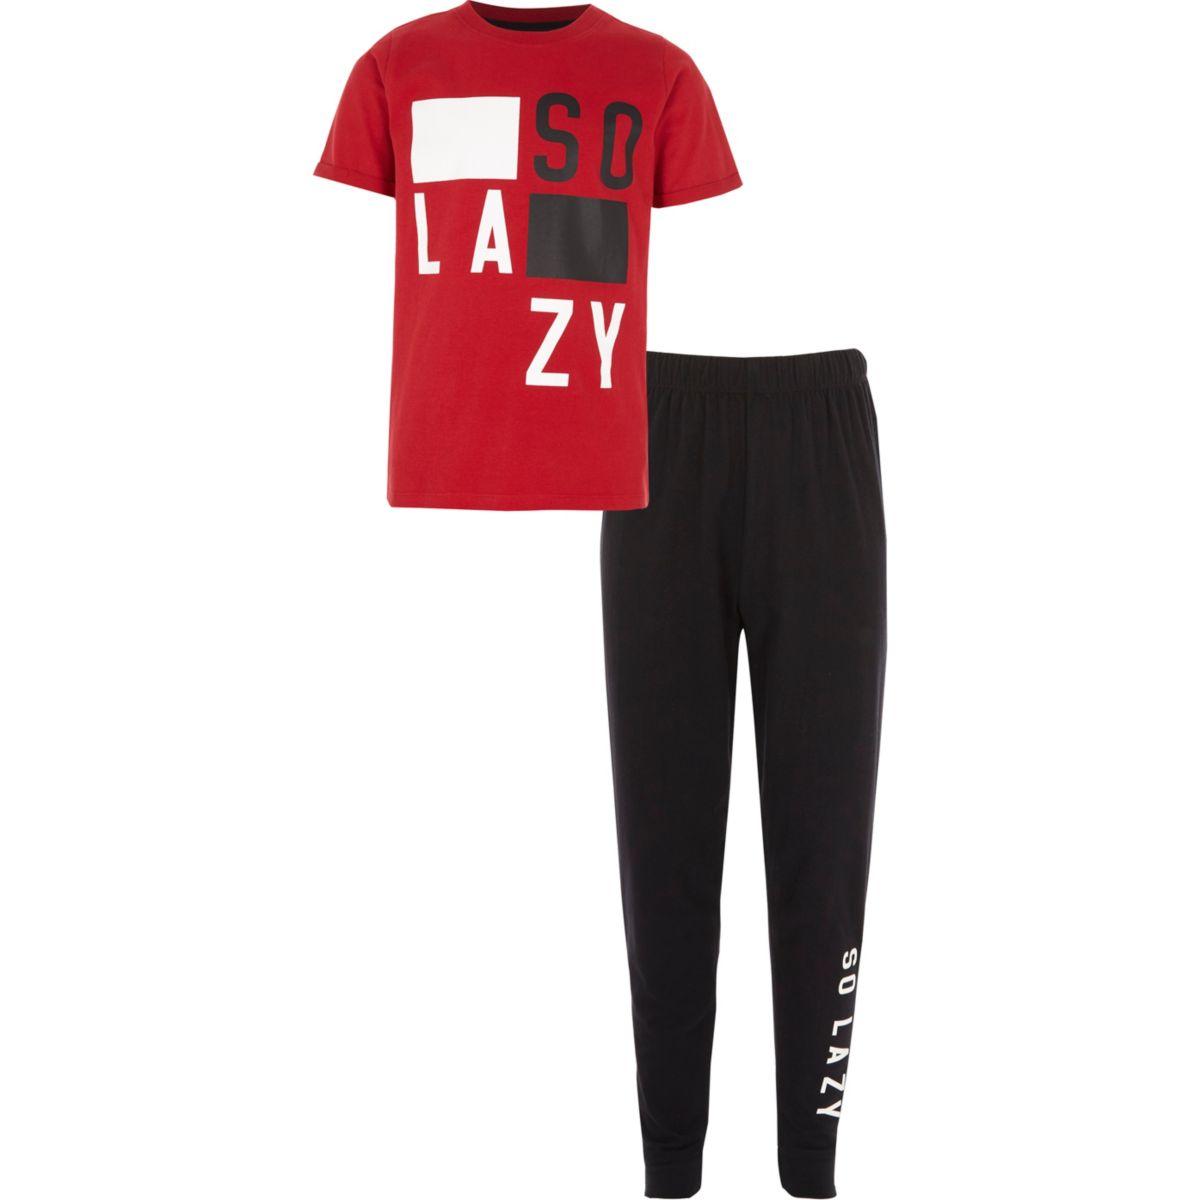 Boys red 'so lazy' pyjama set